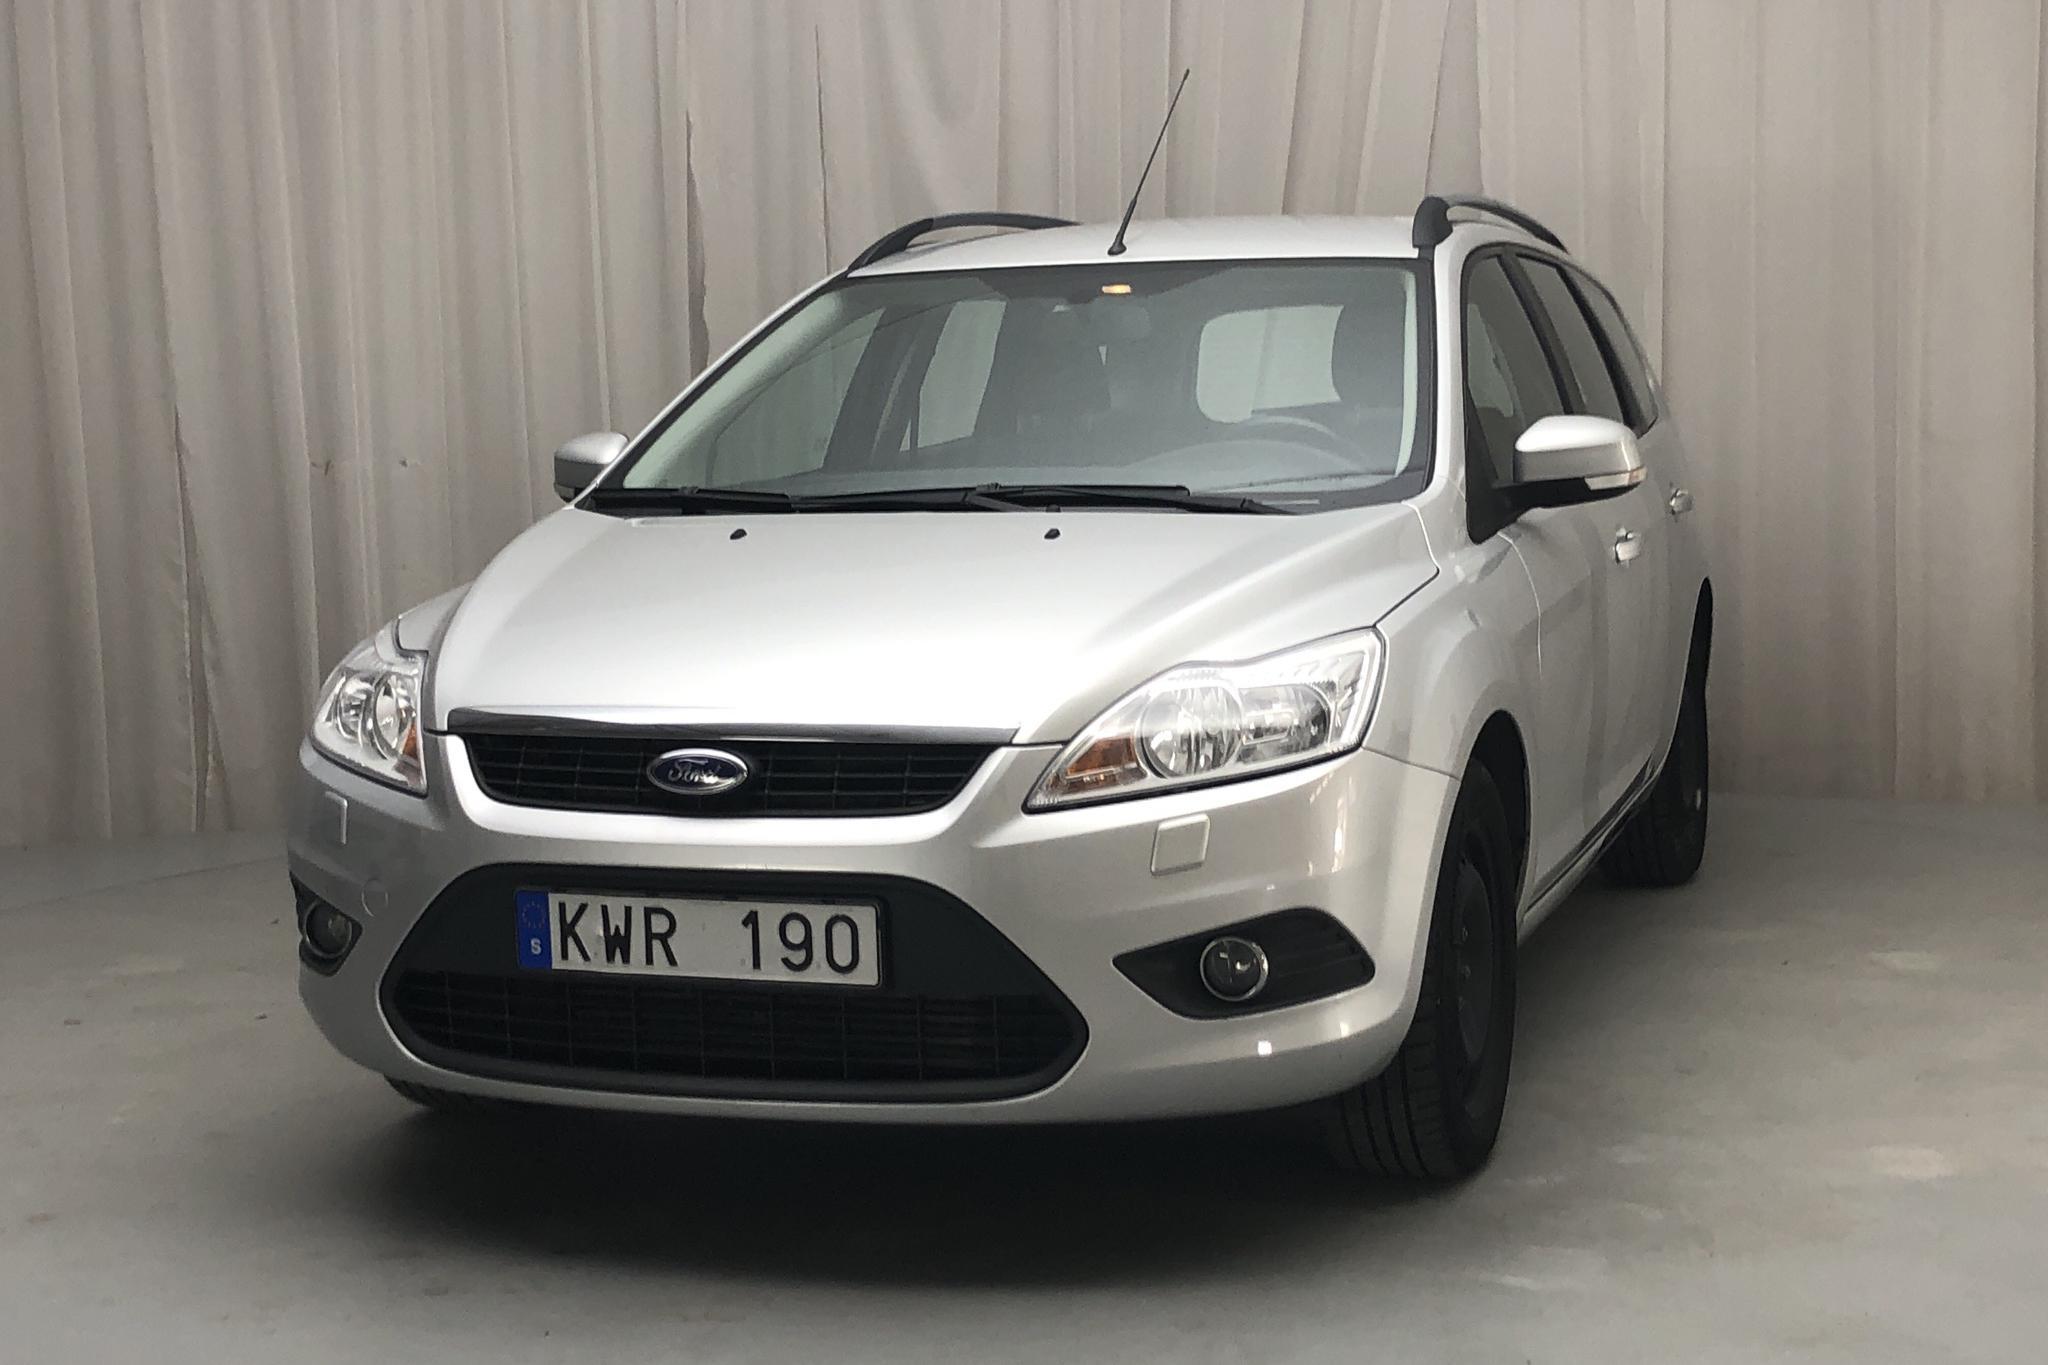 Ford Focus 1.6 TDCi ECOnetic Kombi (90hk) - 10 450 mil - Manuell - grå - 2011